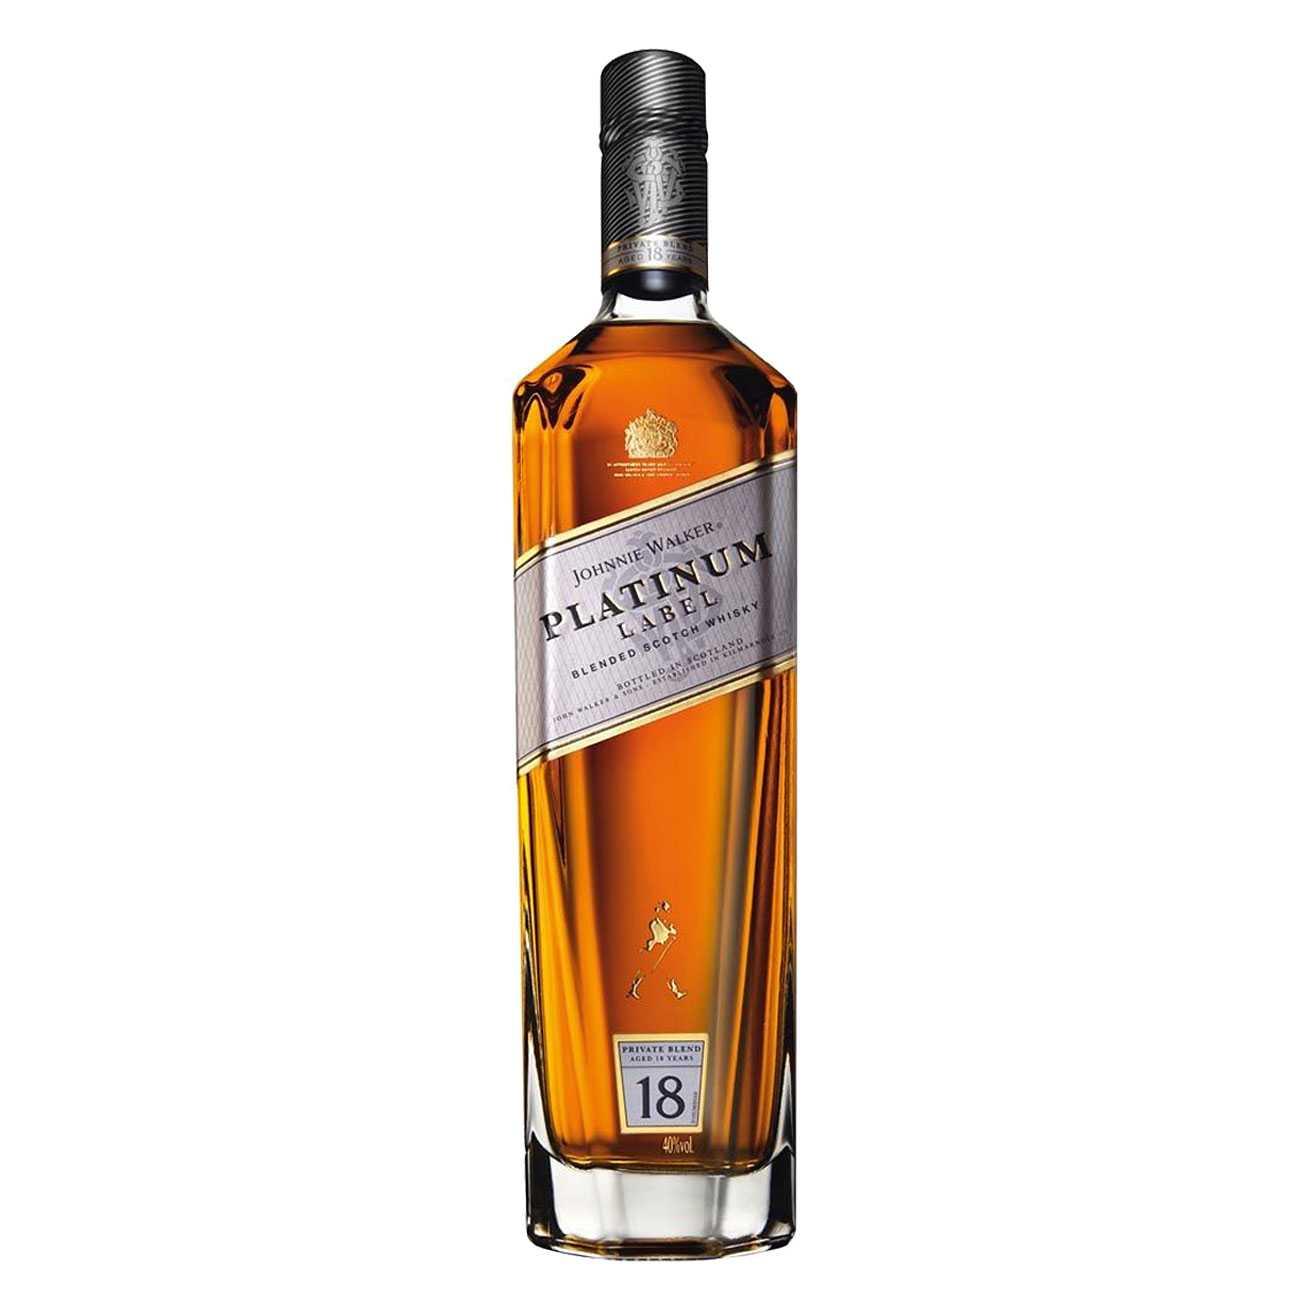 Whisky scotian, PLATINUM LABEL 18 YEARS OLD 1000 ML, Johnnie Walker